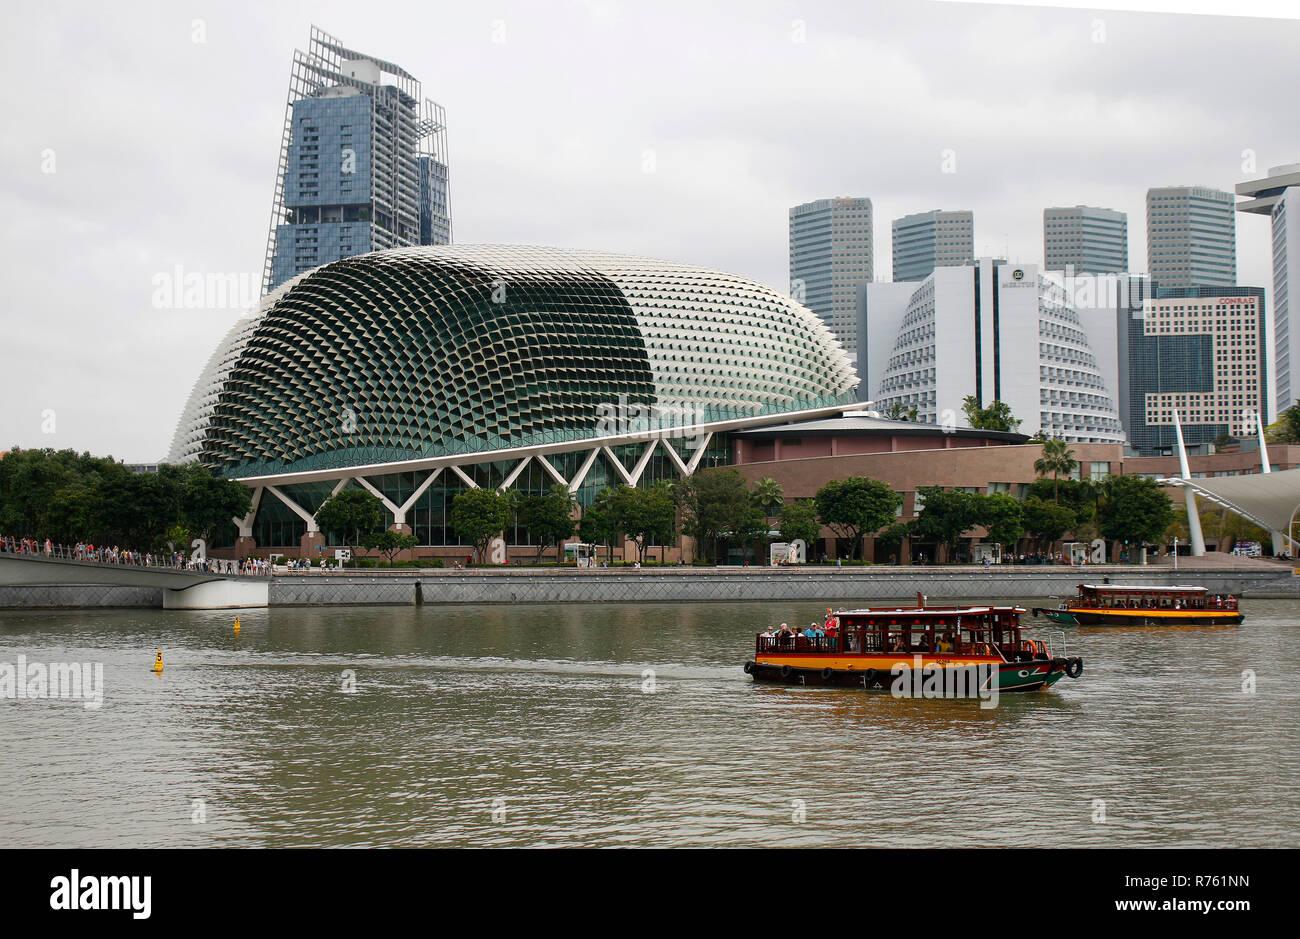 Hochhaeuser, Skyline, Singapur. - Stock Image